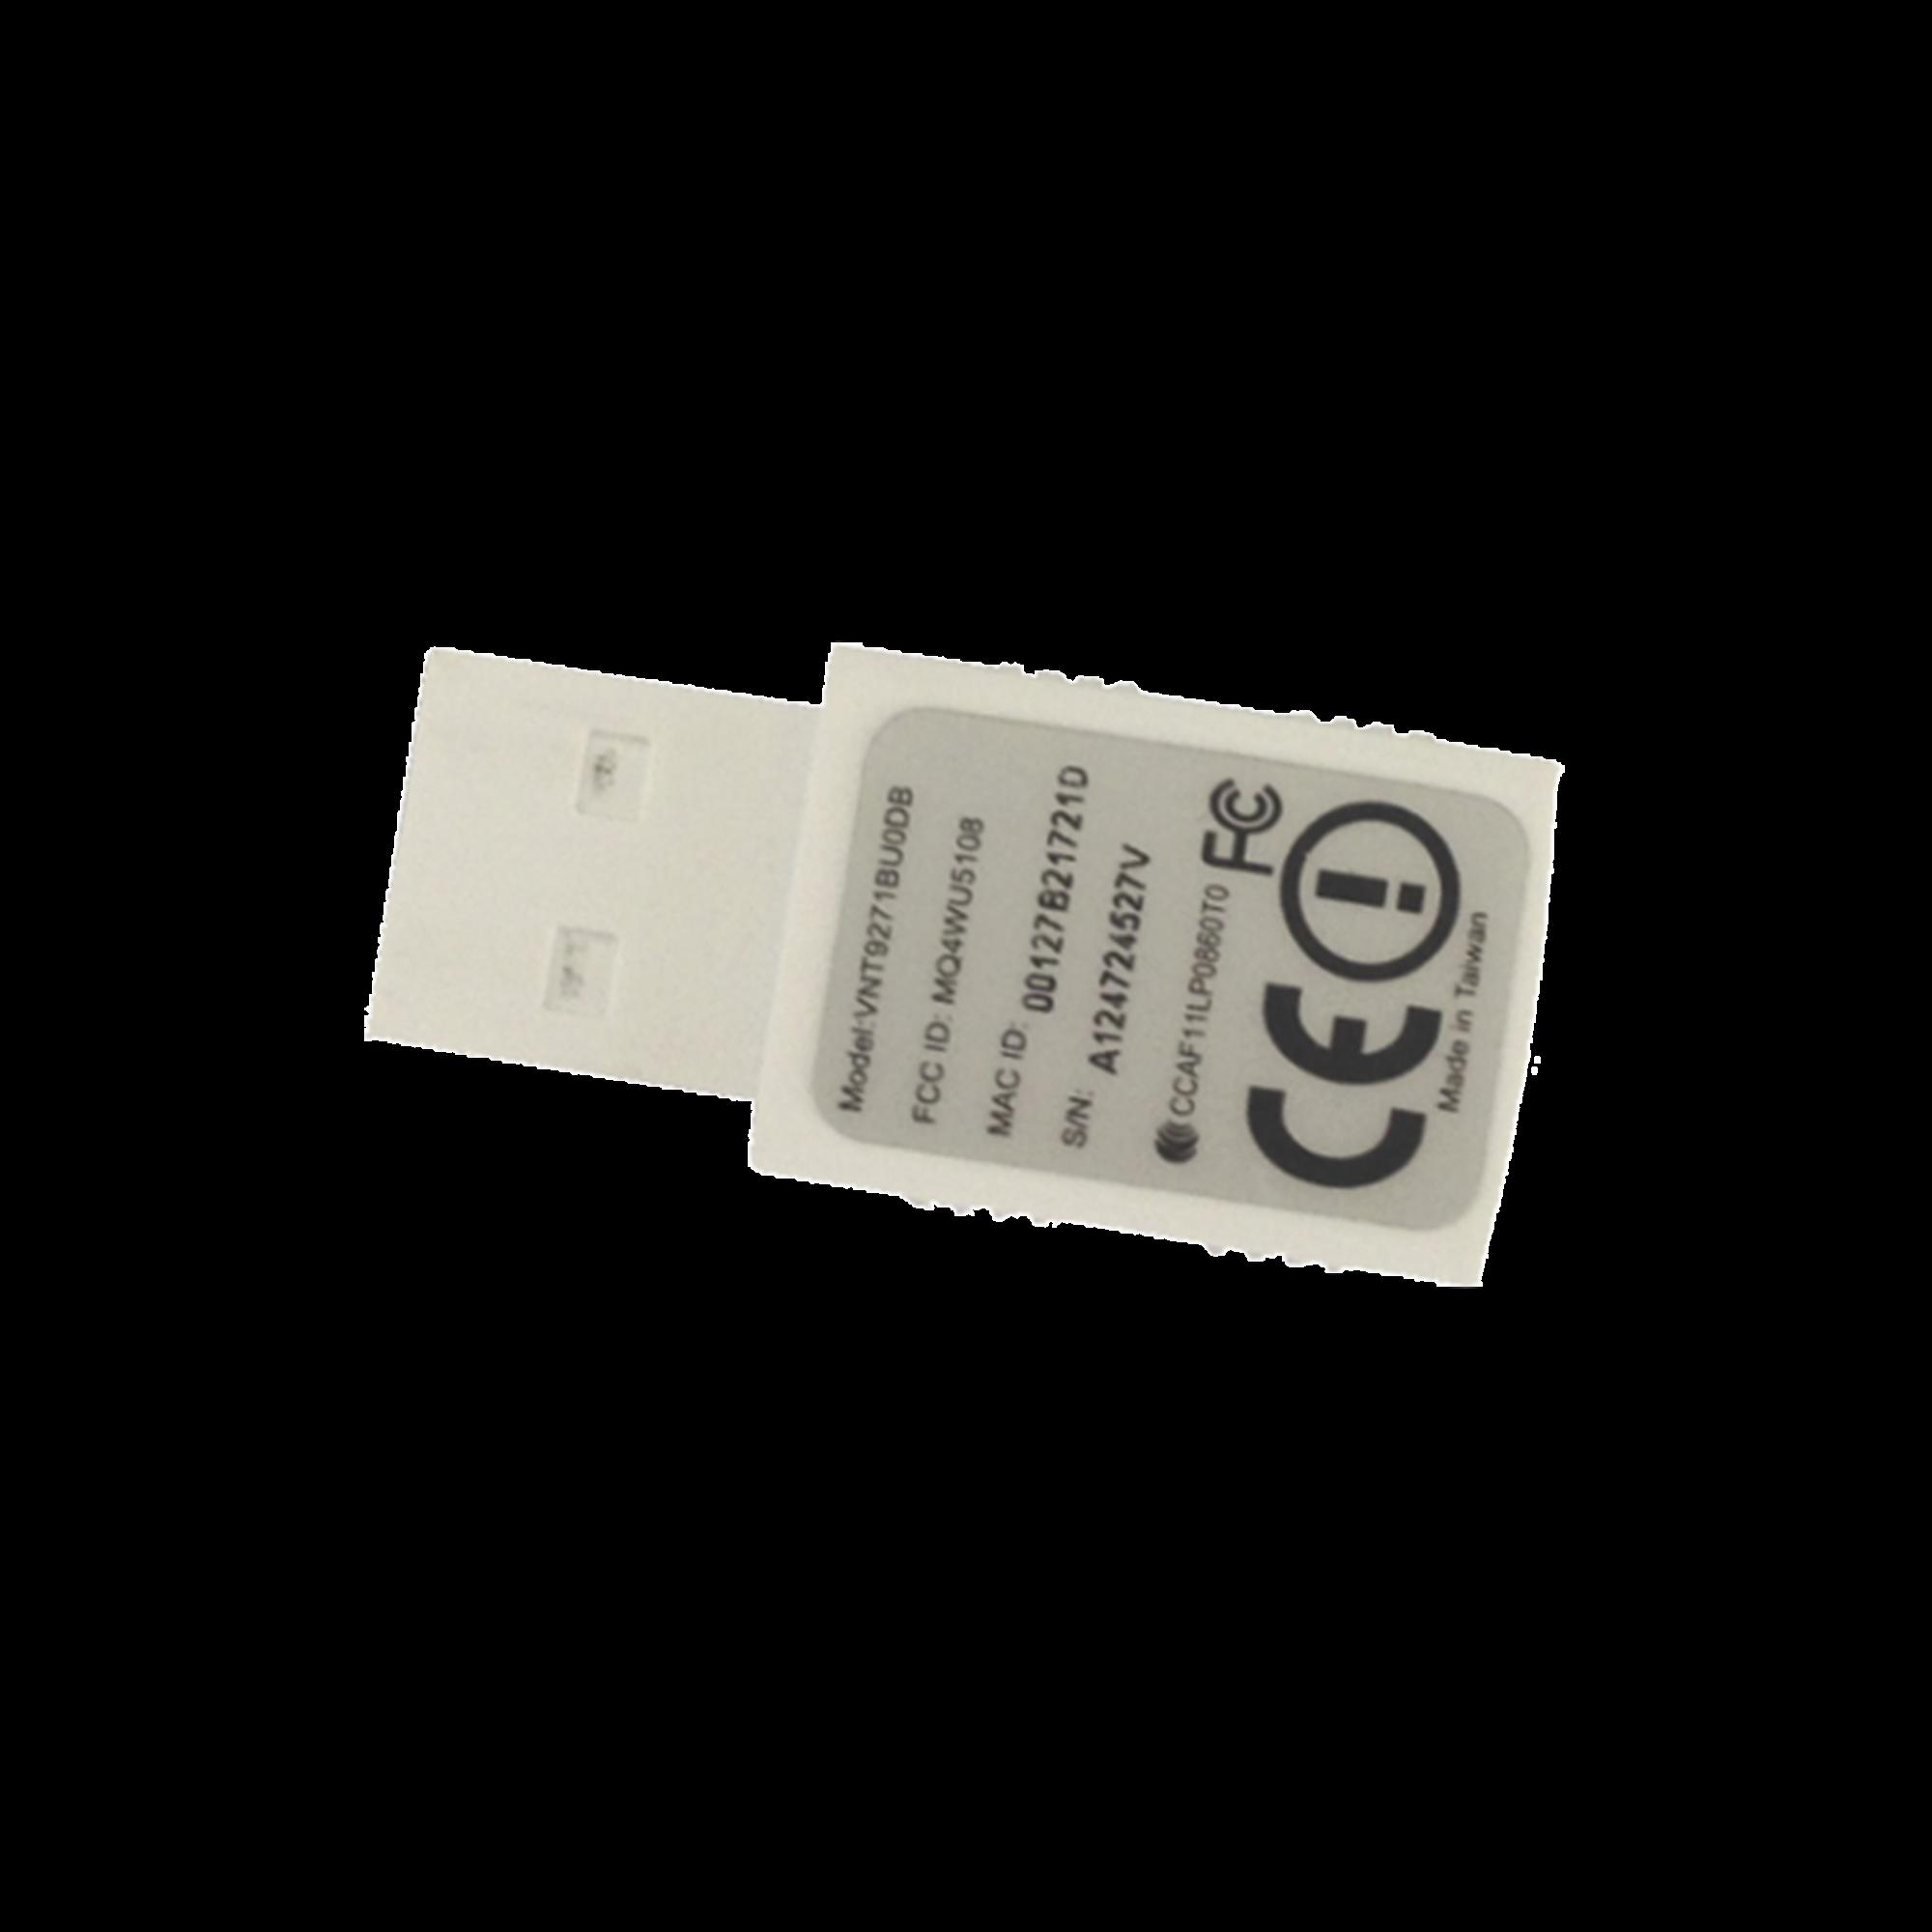 Modulo para Monitoreo por Wifi del Monitor BDG-256